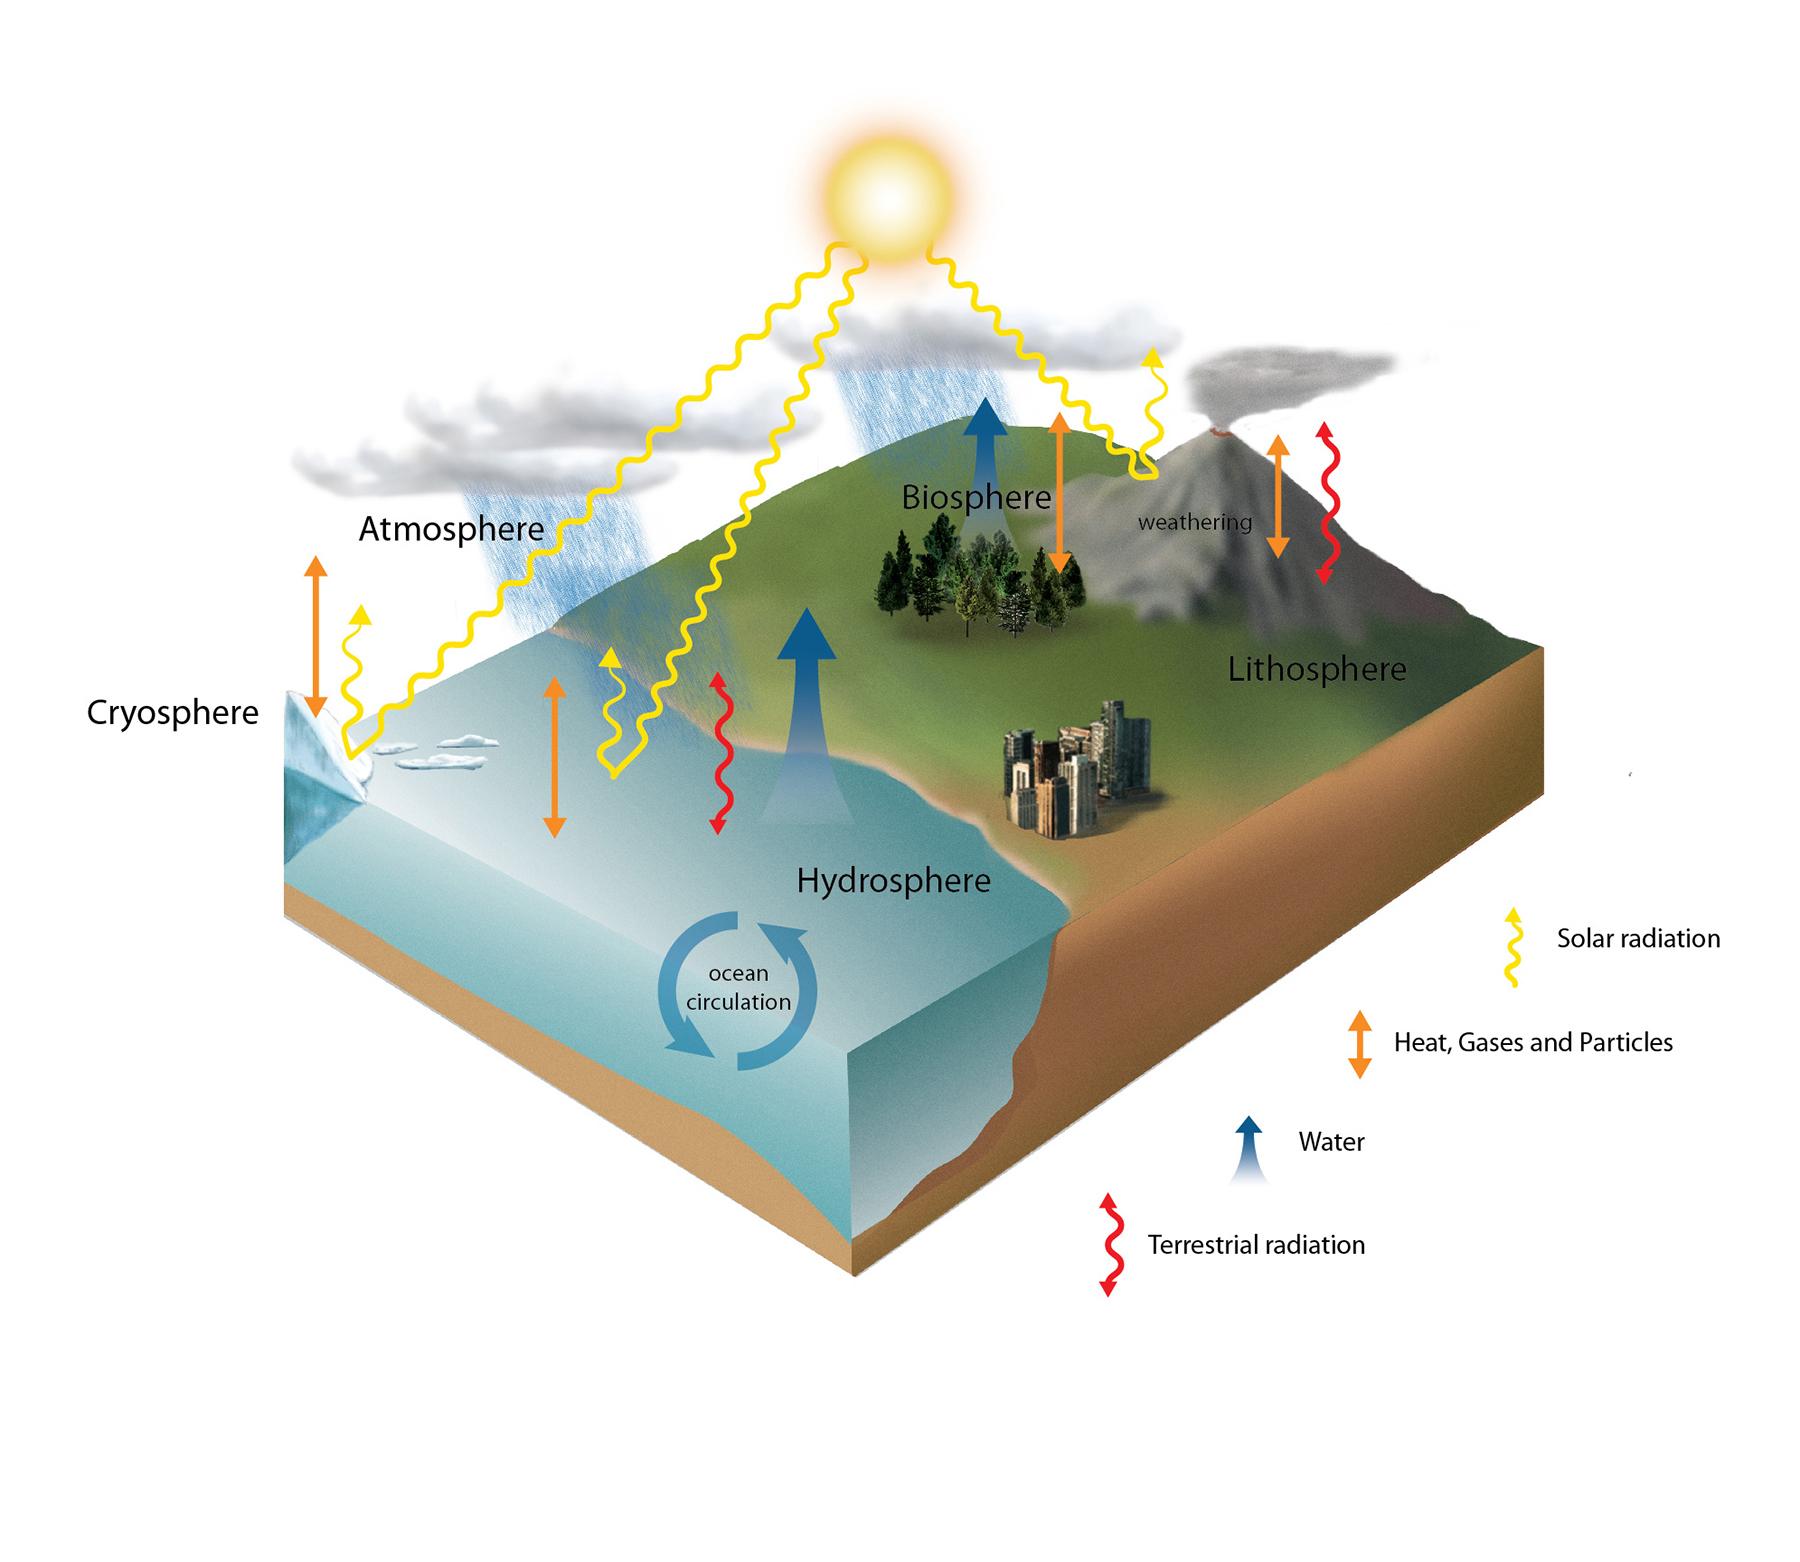 Figure1.8_ClimateSystem_Nov23.jpg